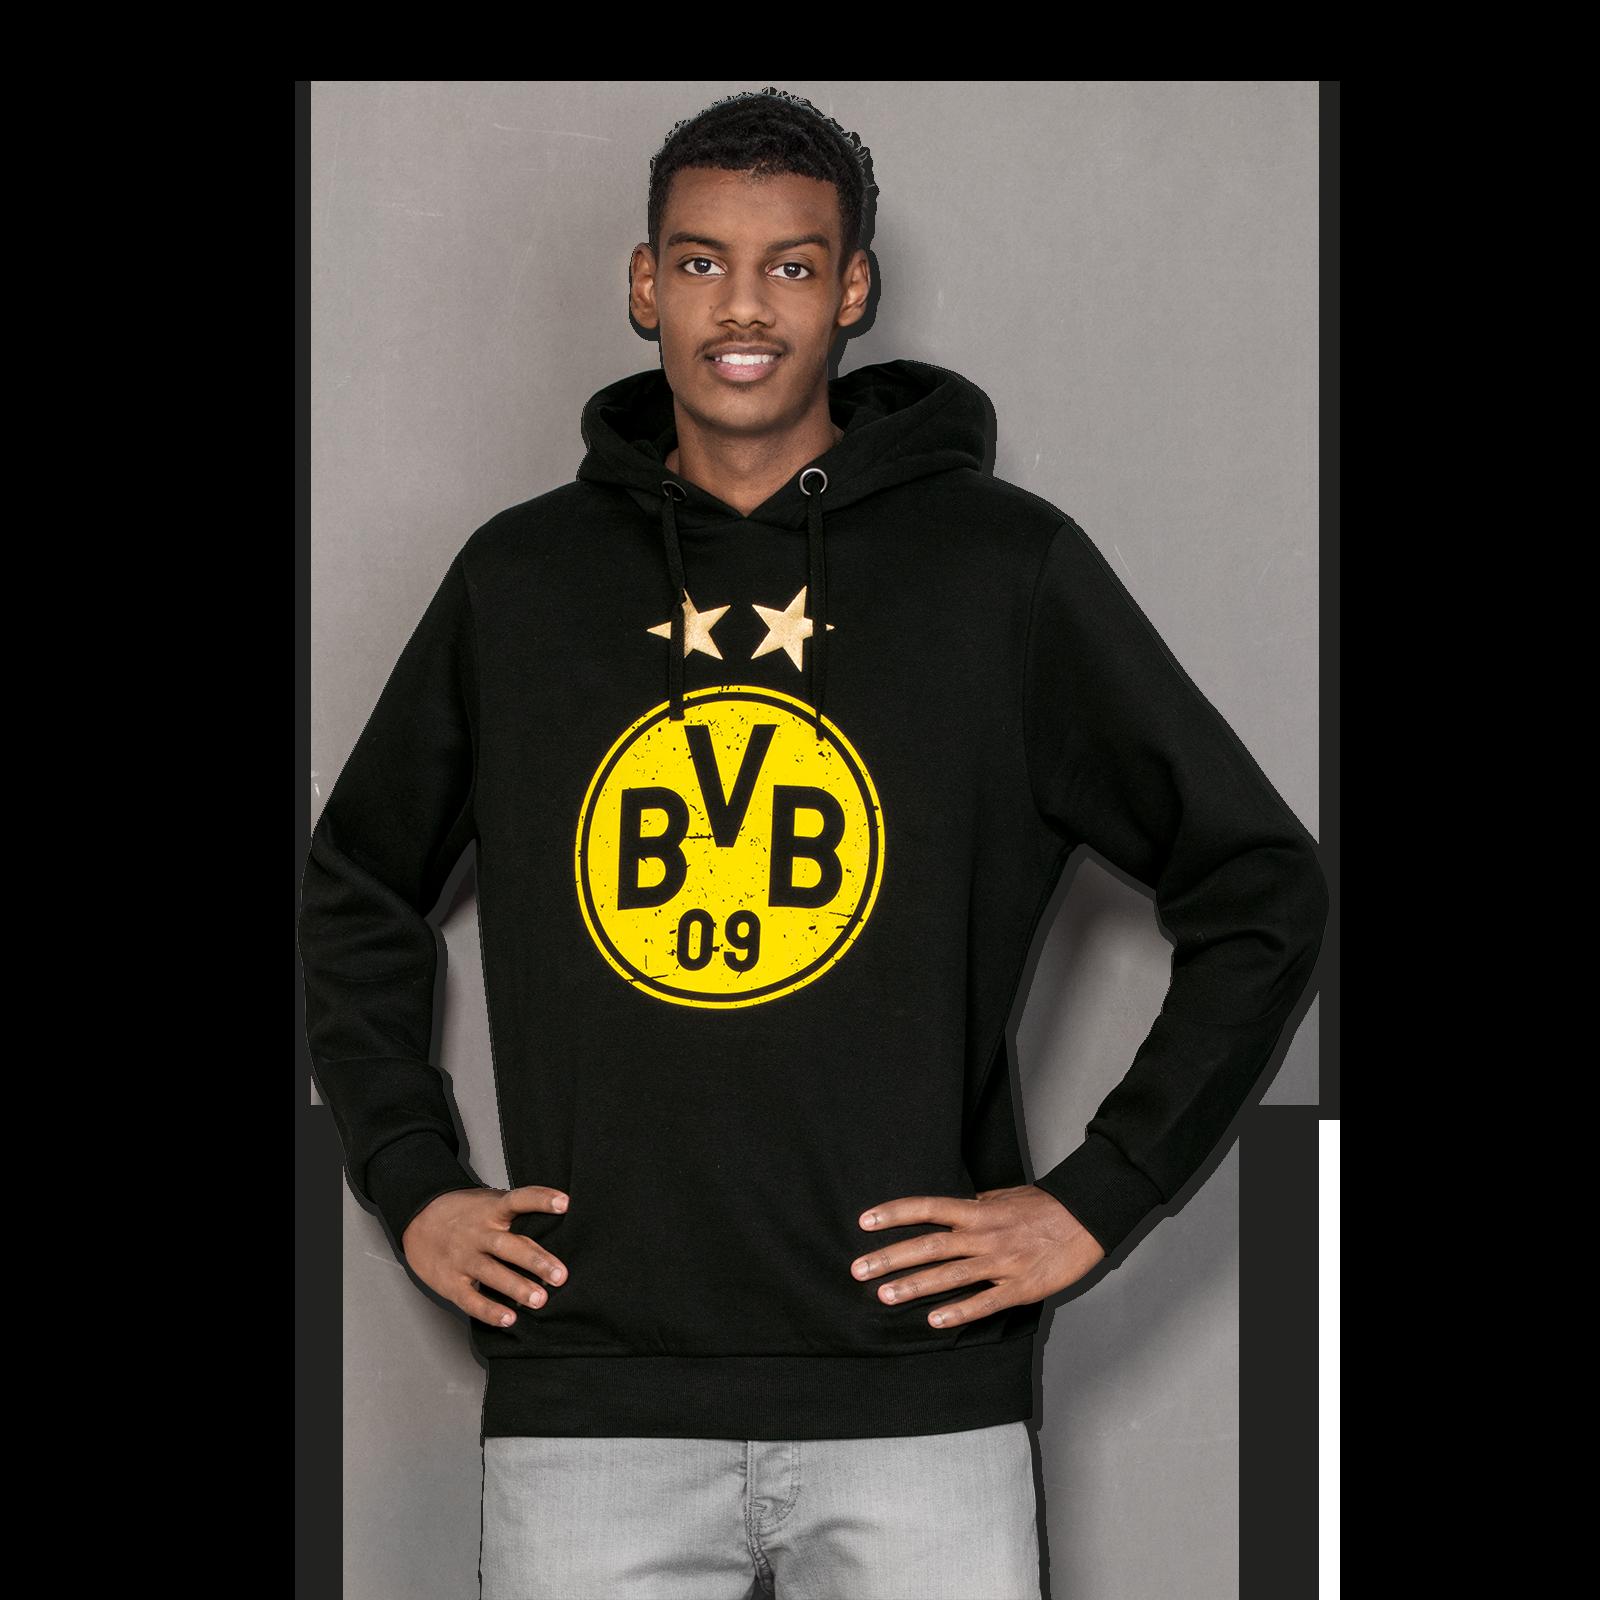 bvb kapuzen sweatshirt mit logo pullover herren offizieller bvb online fanshop. Black Bedroom Furniture Sets. Home Design Ideas